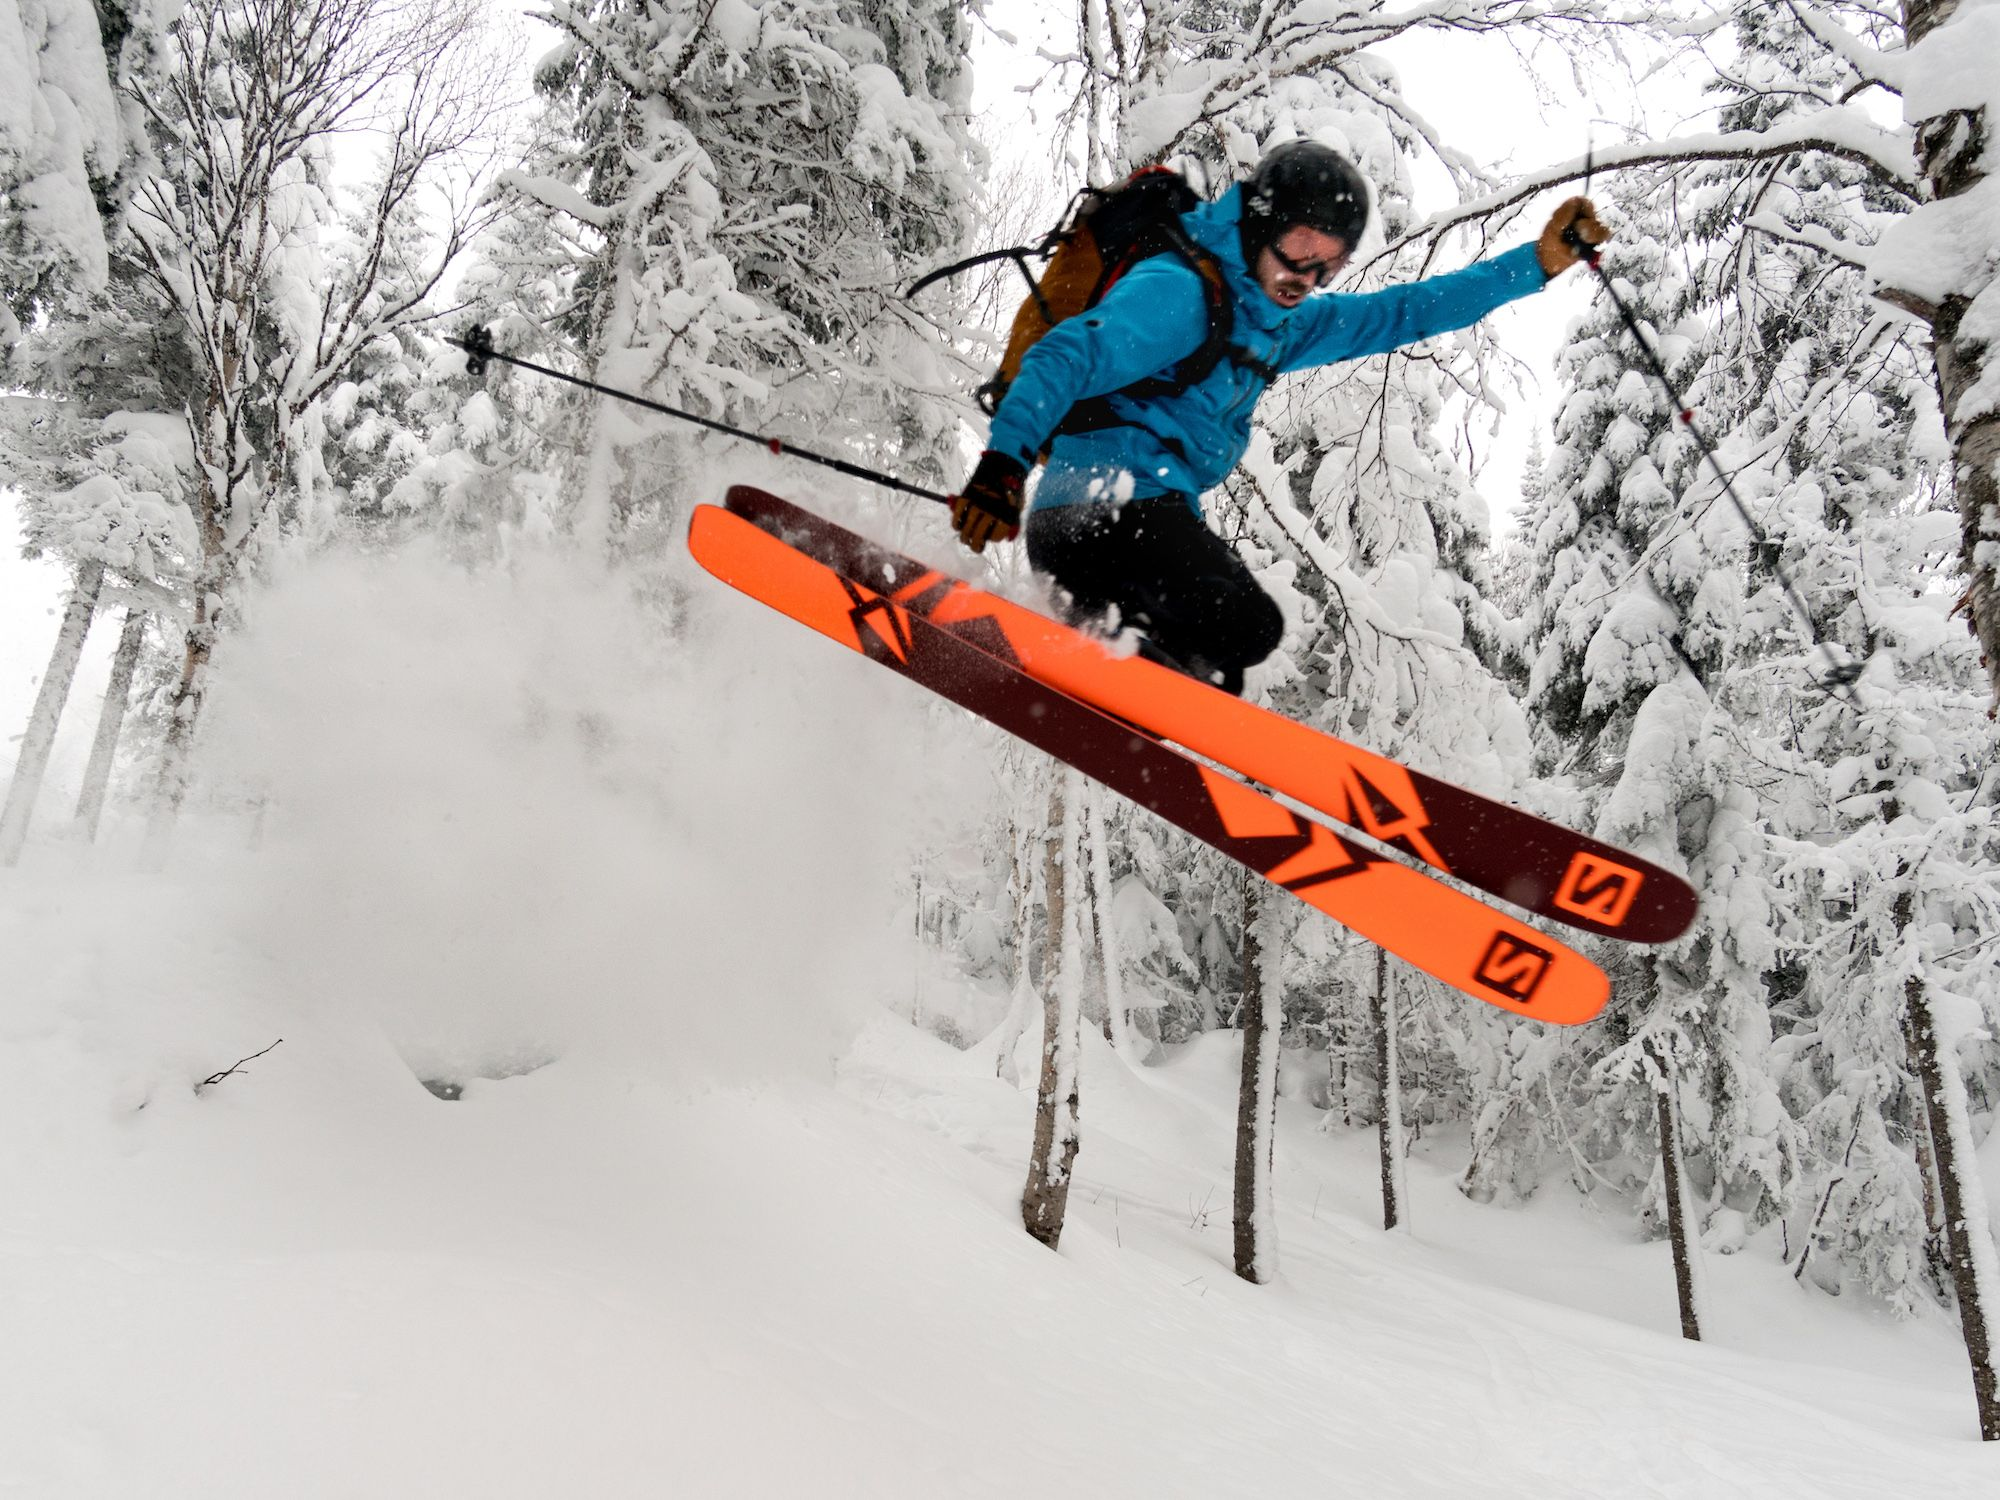 Thomas-Thiery-skieur-Nicolas-Cloutier-dos-de-cheval-12